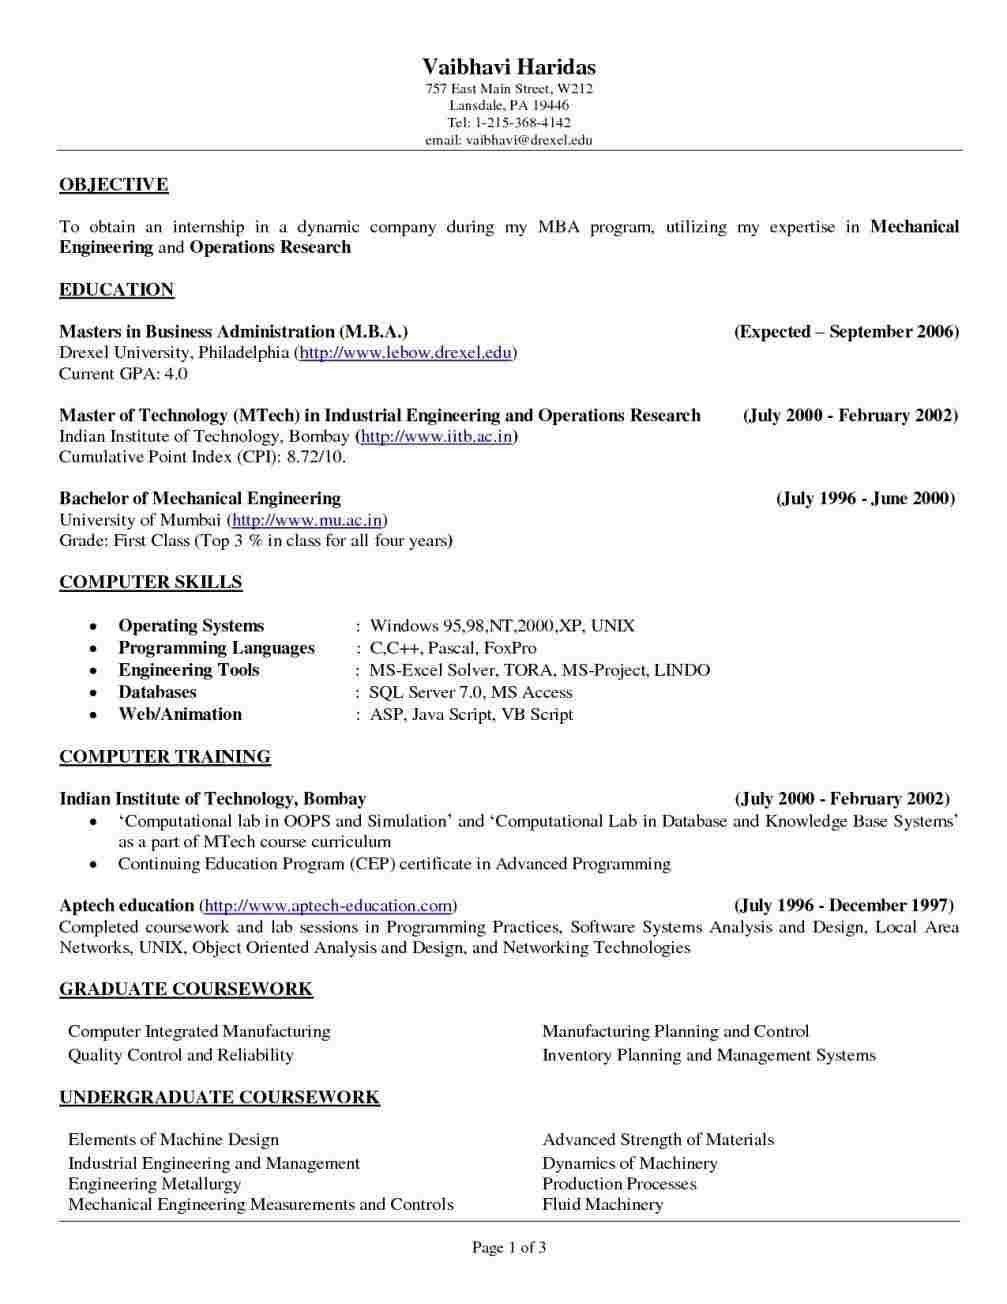 Resume Templates Quora Resumetemplates Resume Objective Statement Examples Resume Skills Resume Objective Examples